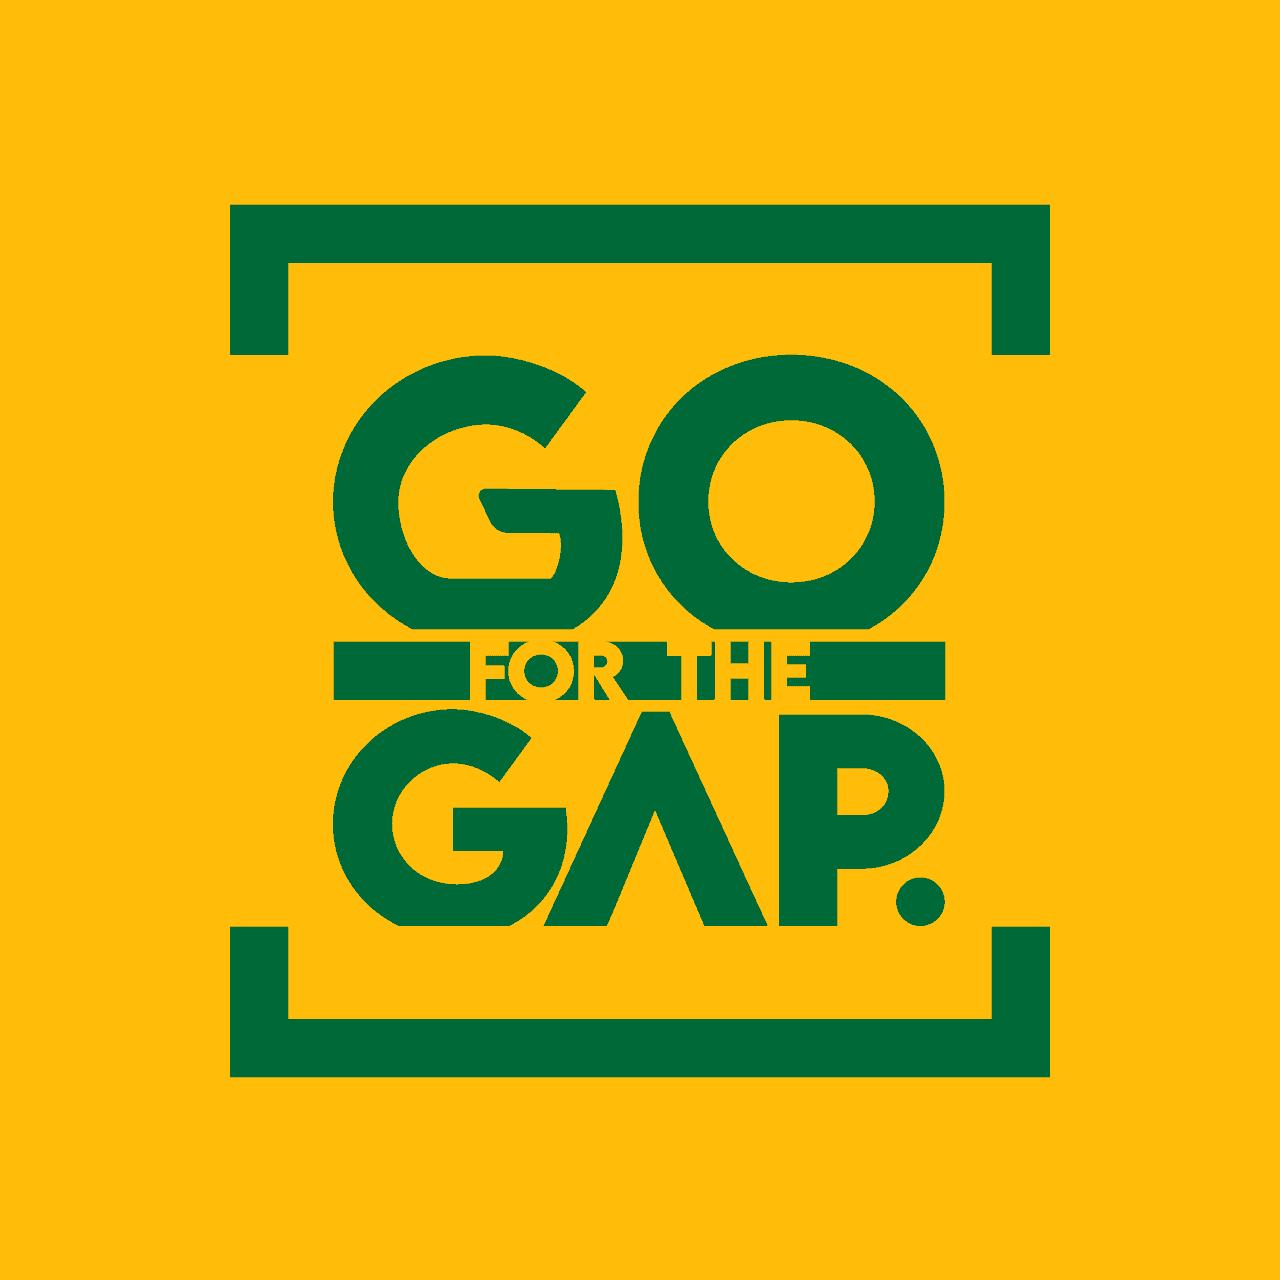 The GPBox - Go for the Gap